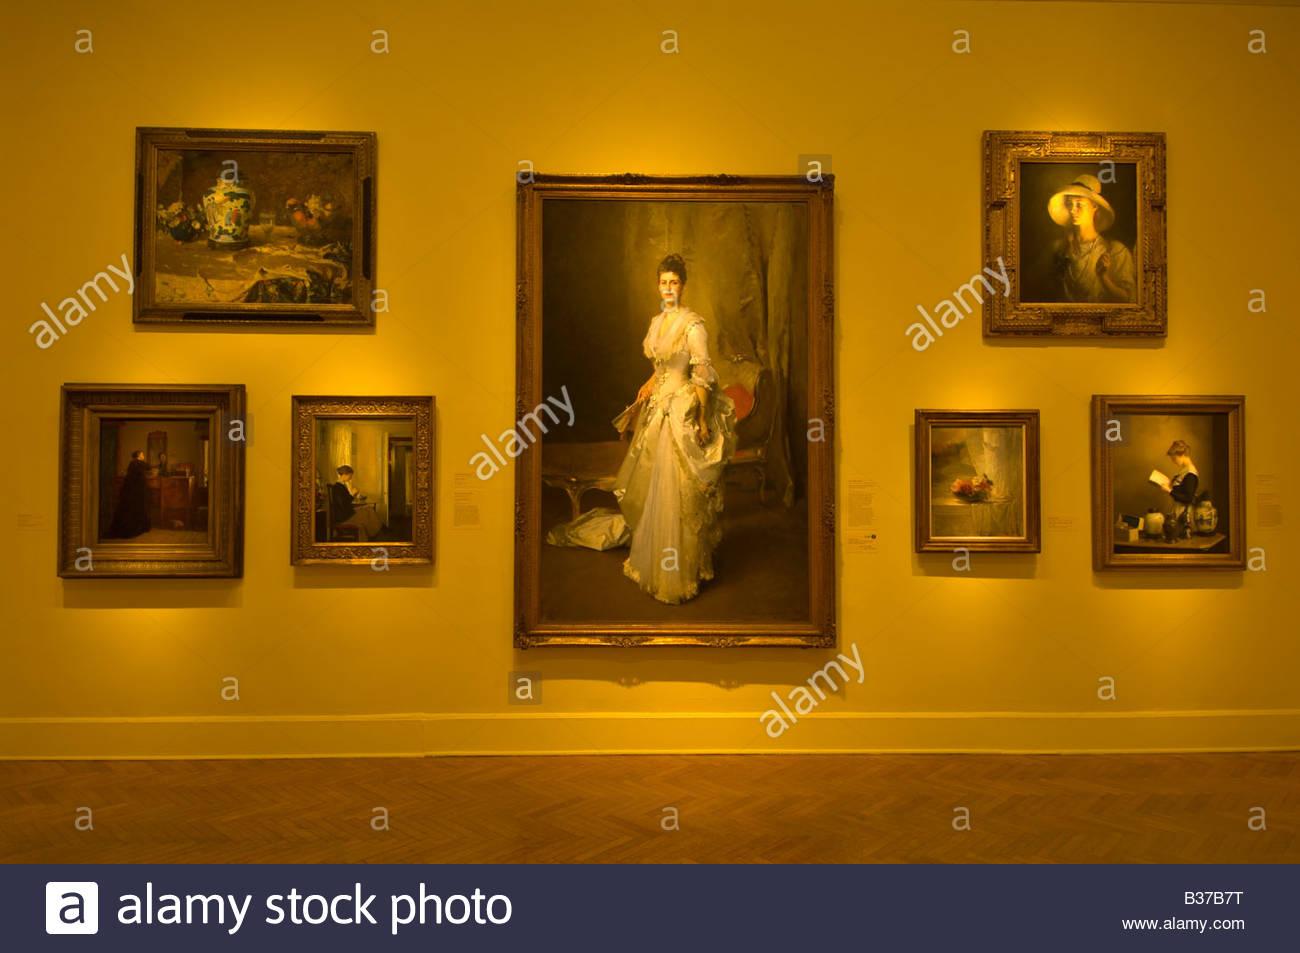 American Evolution exhibition Corcoran Gallery of Art Washington D C U S A - Stock Image